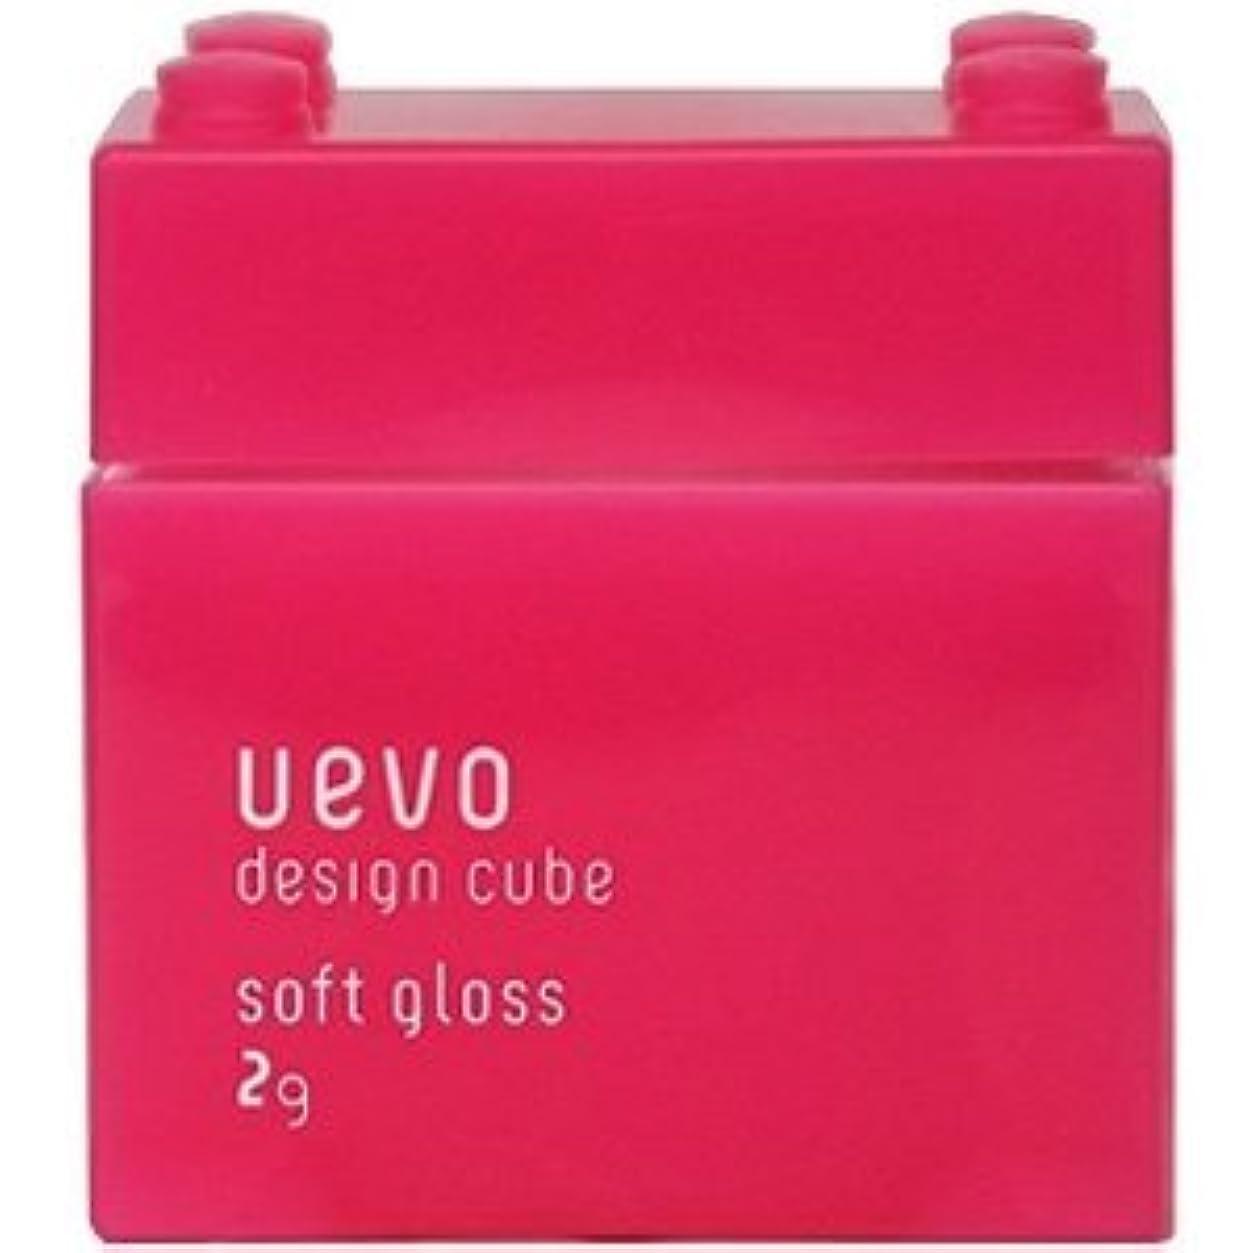 【X2個セット】 デミ ウェーボ デザインキューブ ソフトグロス 80g soft gloss DEMI uevo design cube